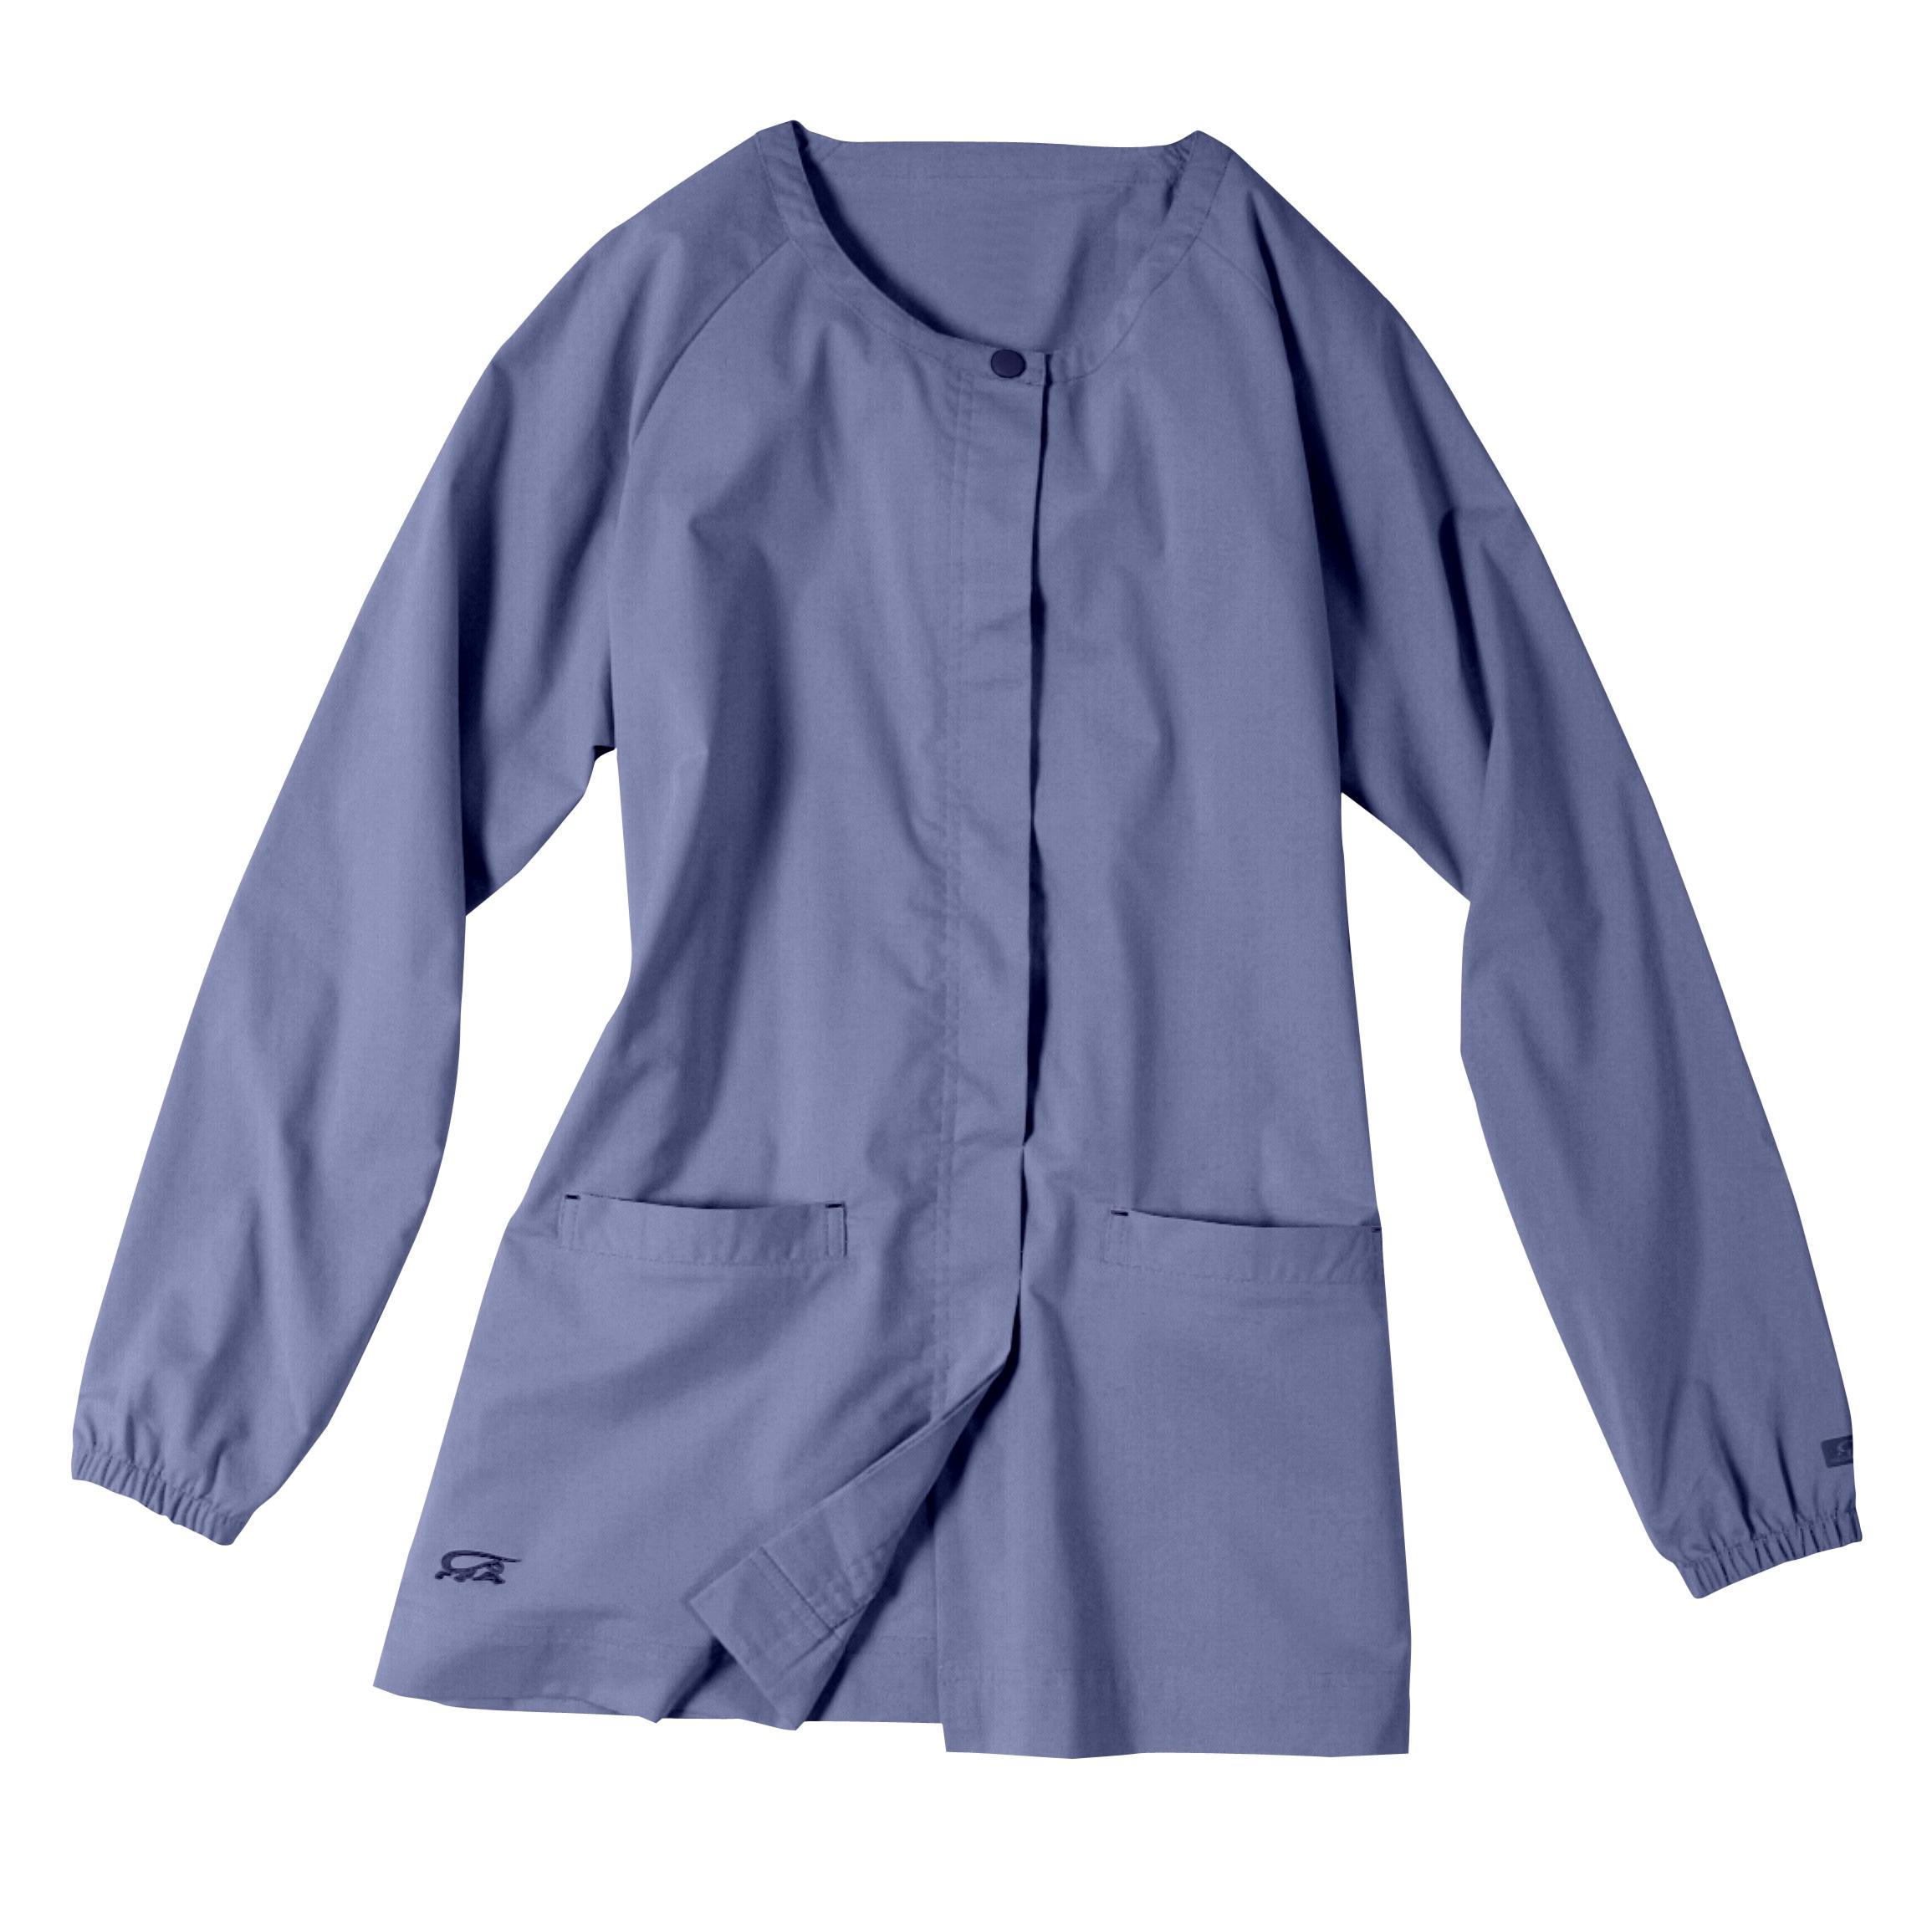 Iguanamed Ceil Blue Women S Nursing Jacket Overstock